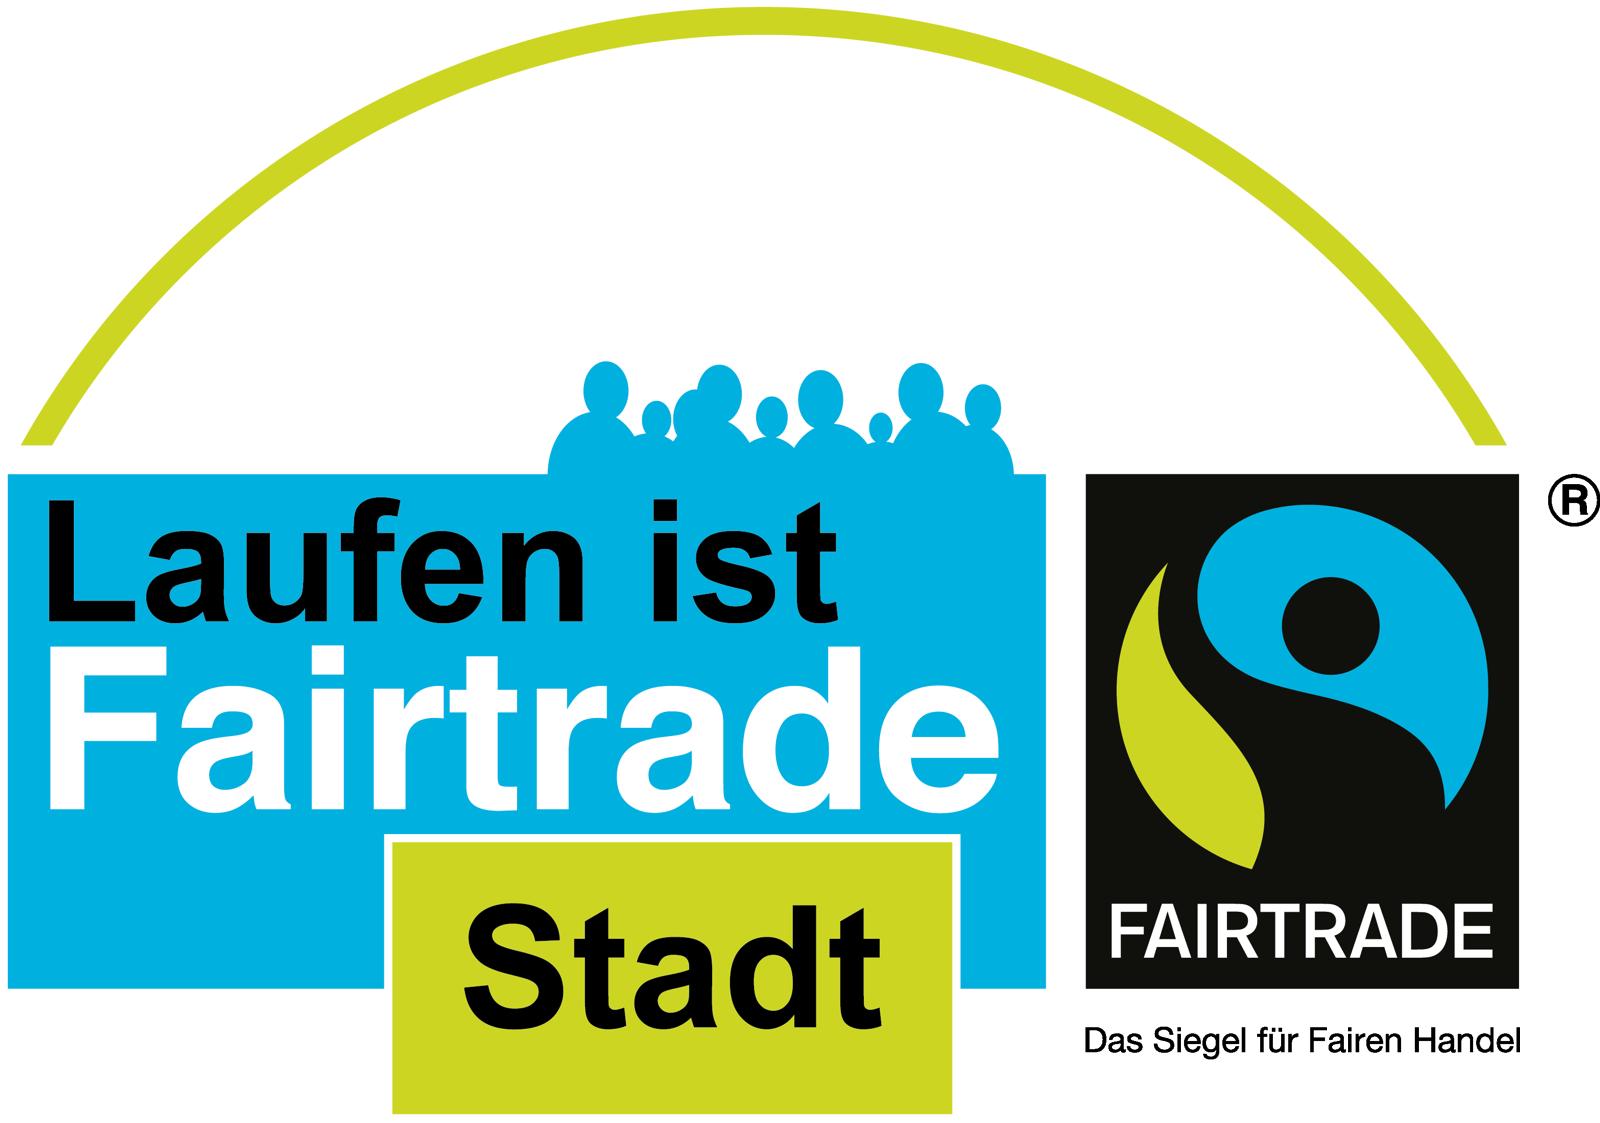 b72e5442fb9e75 Fairtrade Städte Laufen - Oberndorf - Bürgerservice Stadt Laufen